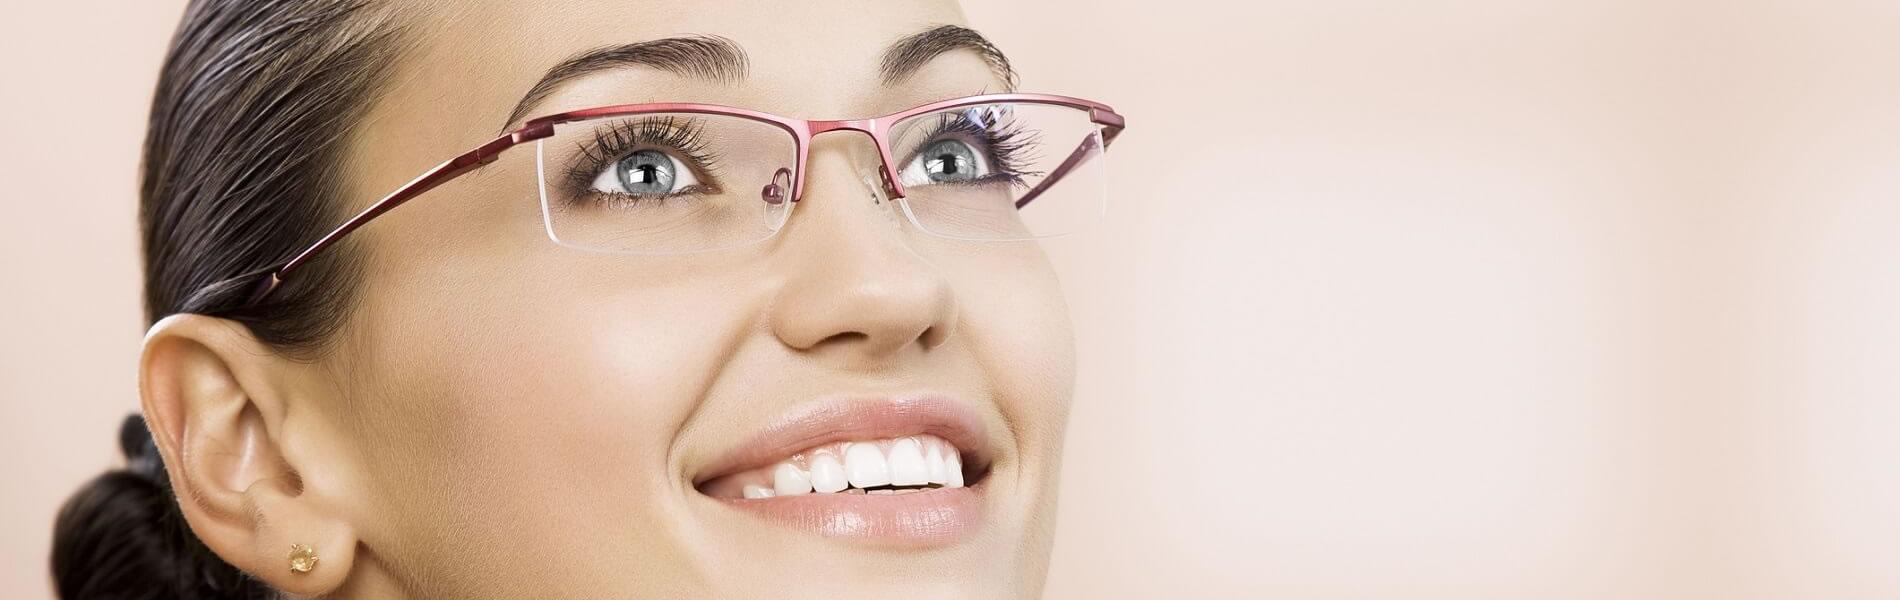 Specijalna oftalmološka bolnica Eliksir cover